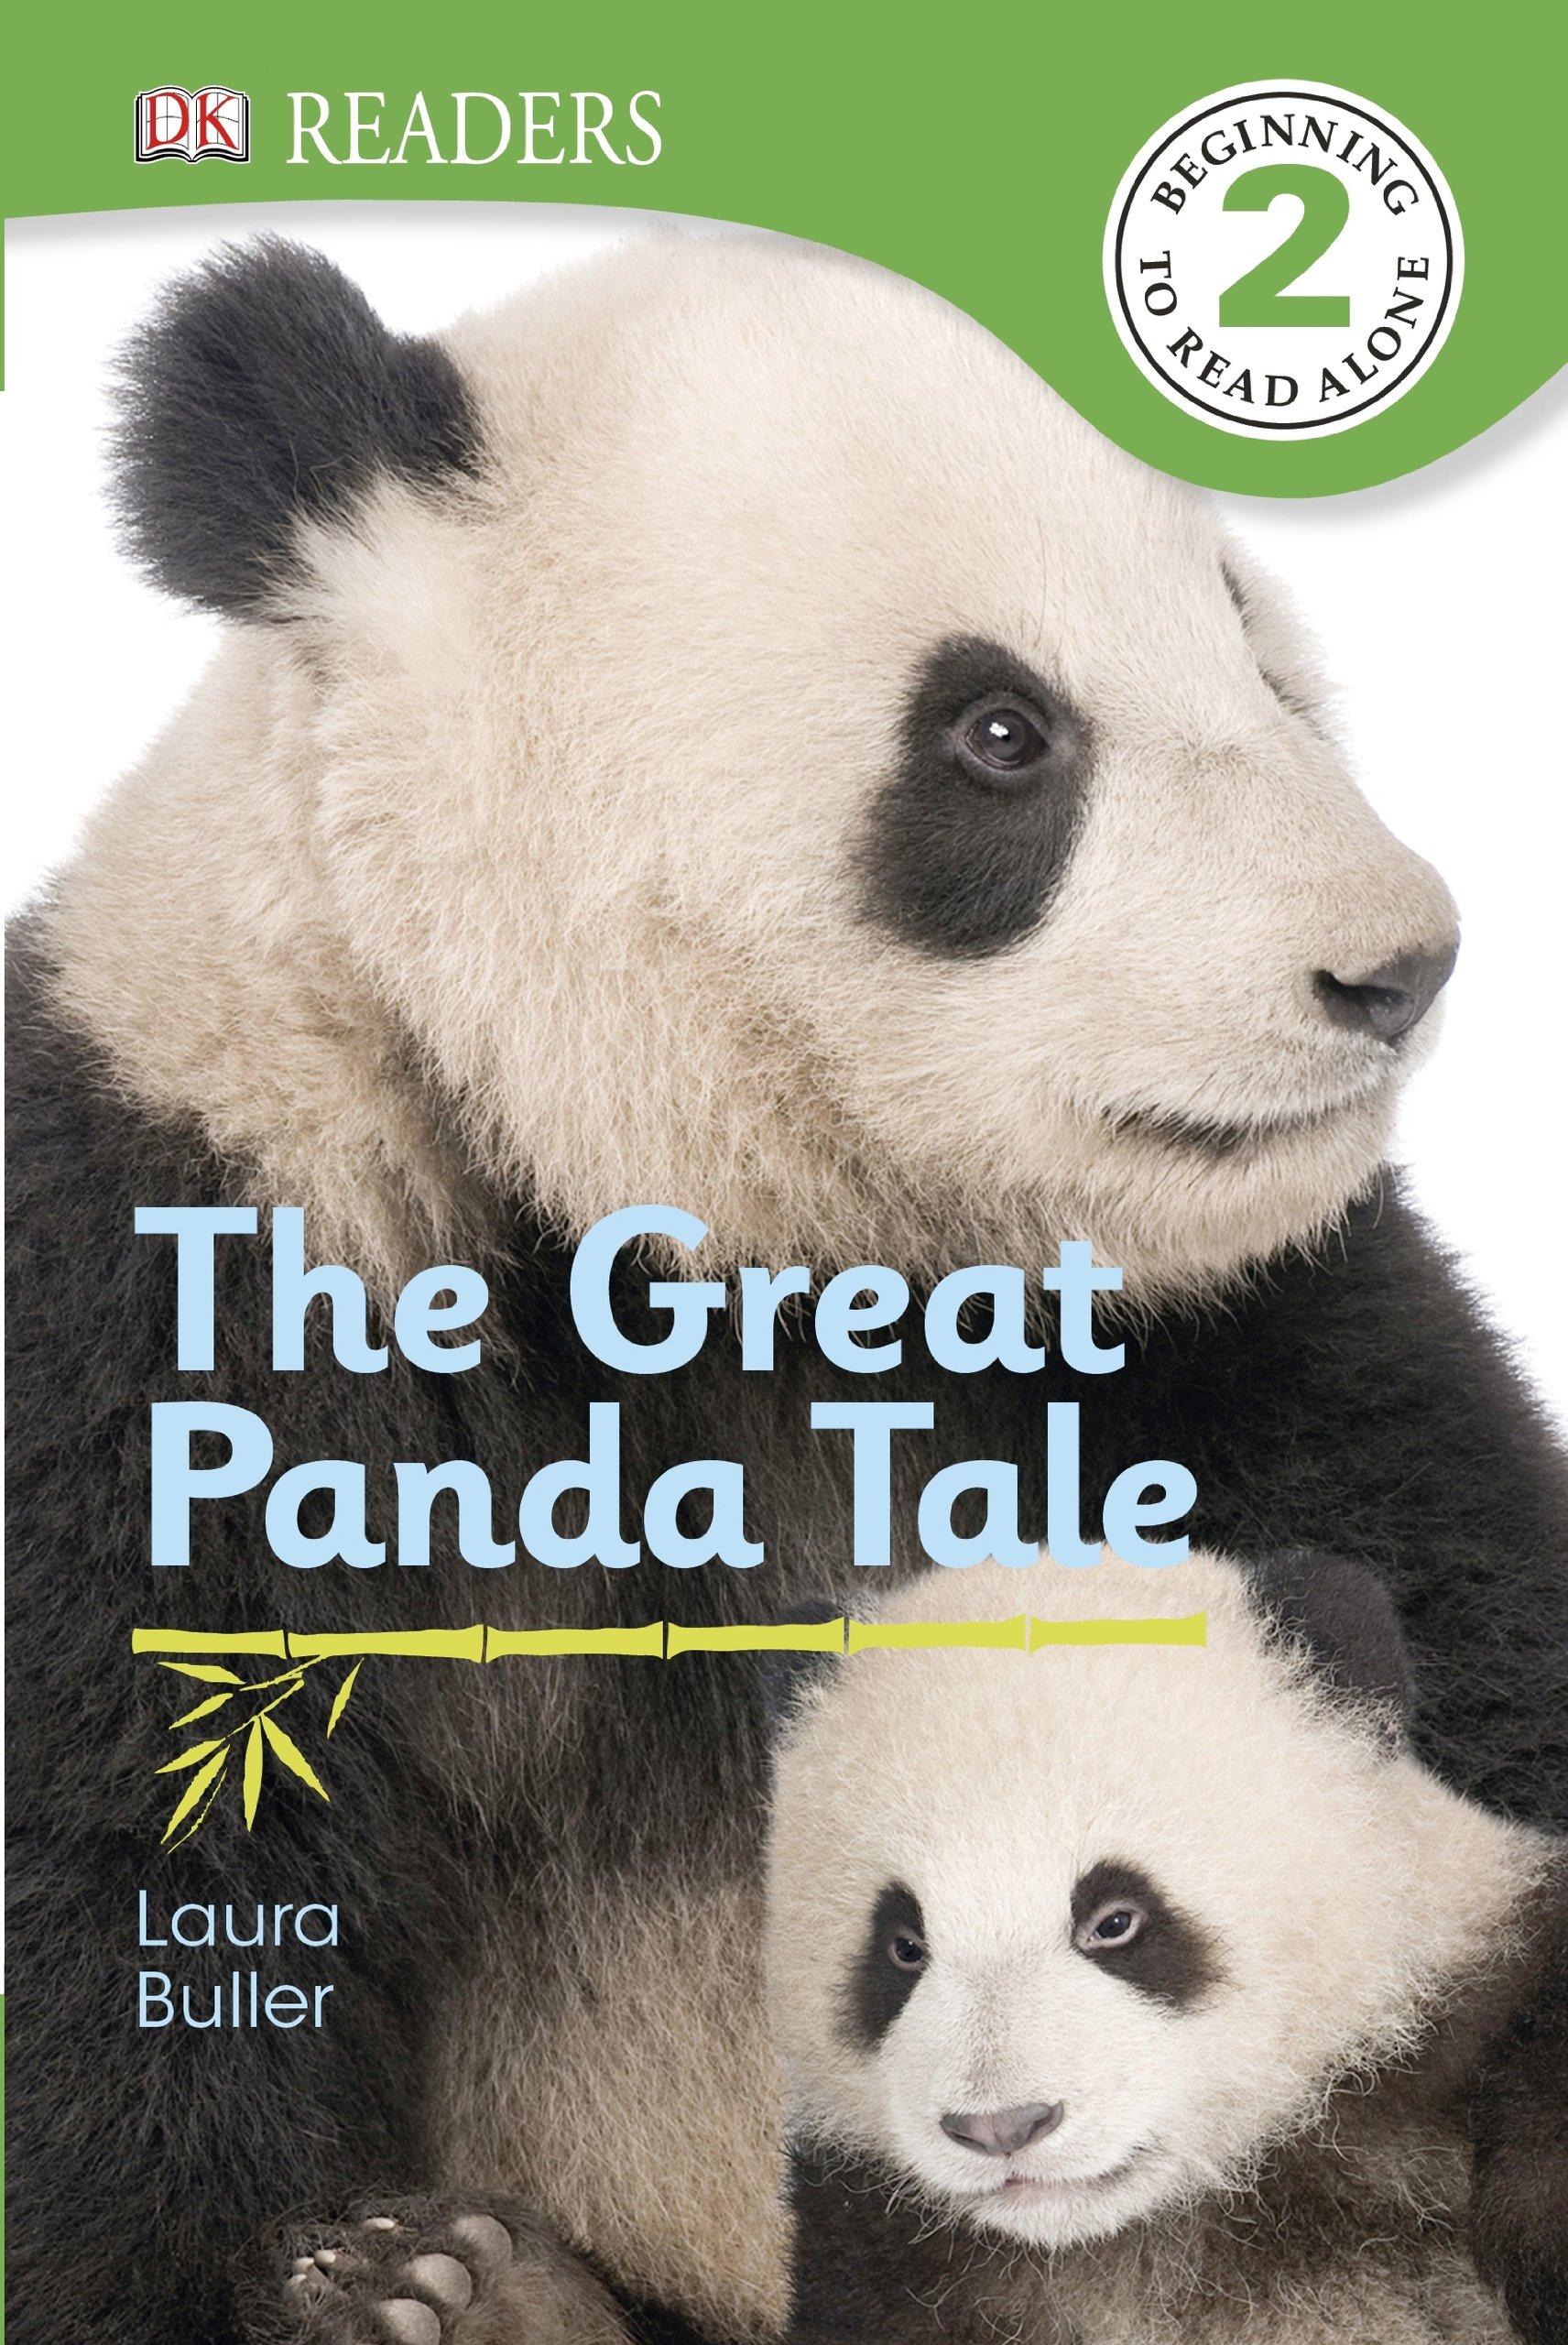 DK Readers L2: The Great Panda Tale pdf